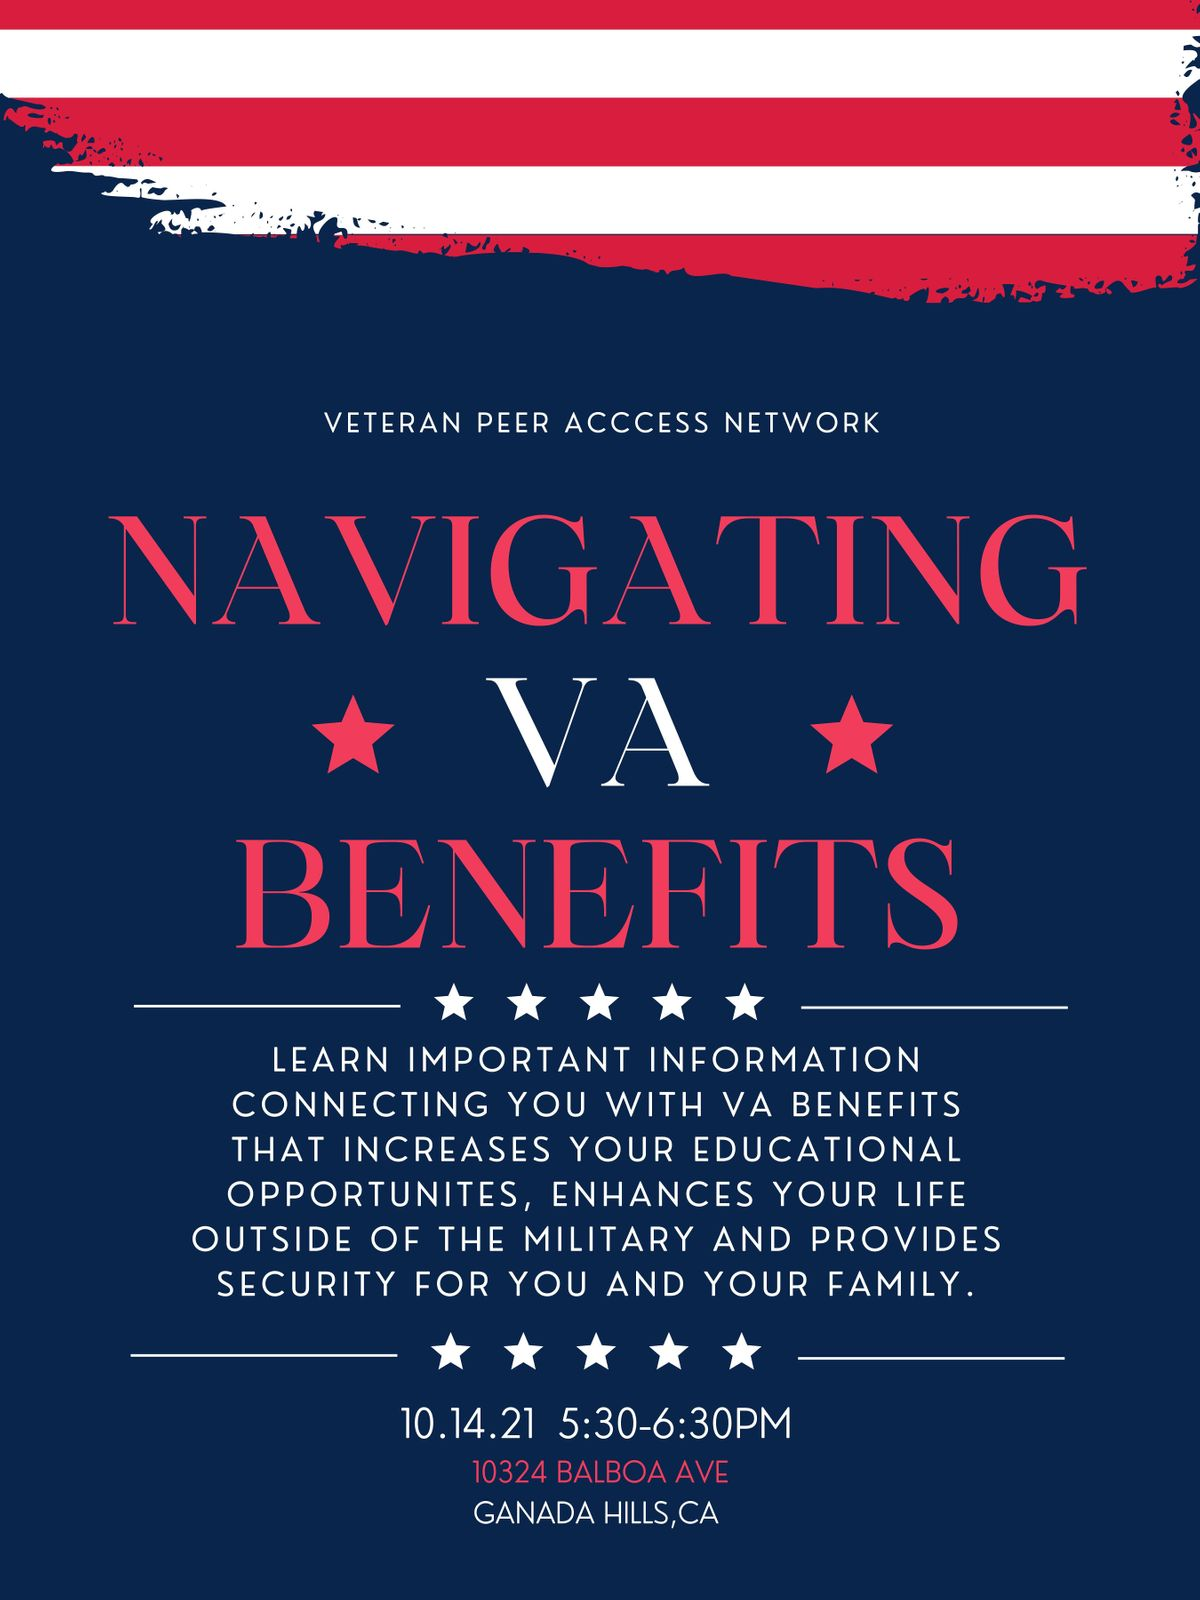 NAVIGATING VA BENEFITS (VPAN)